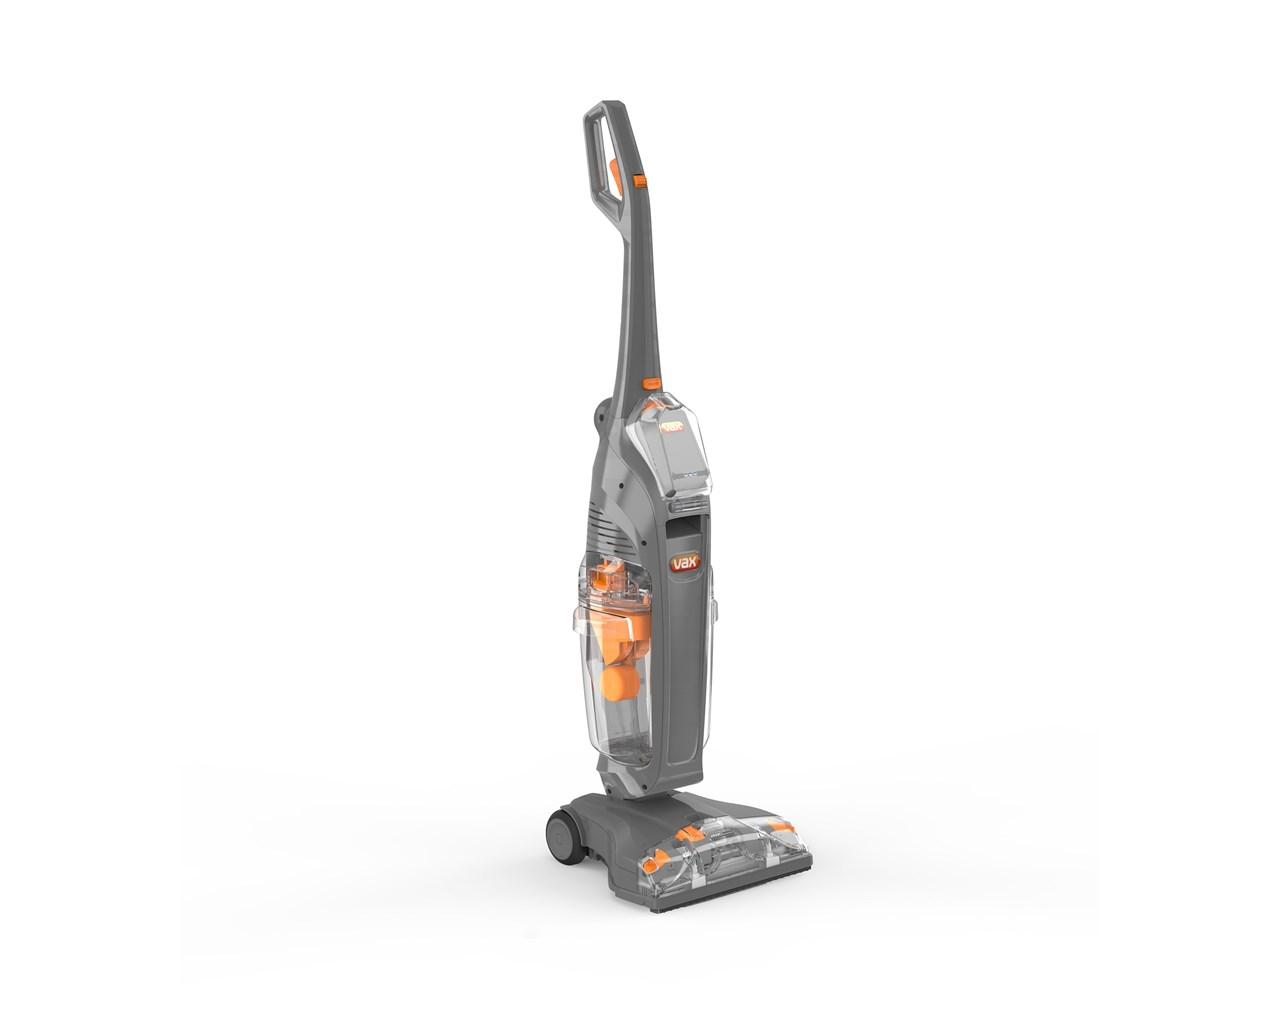 Vax Multi Buy Total Floorcare Kit Vax Promo